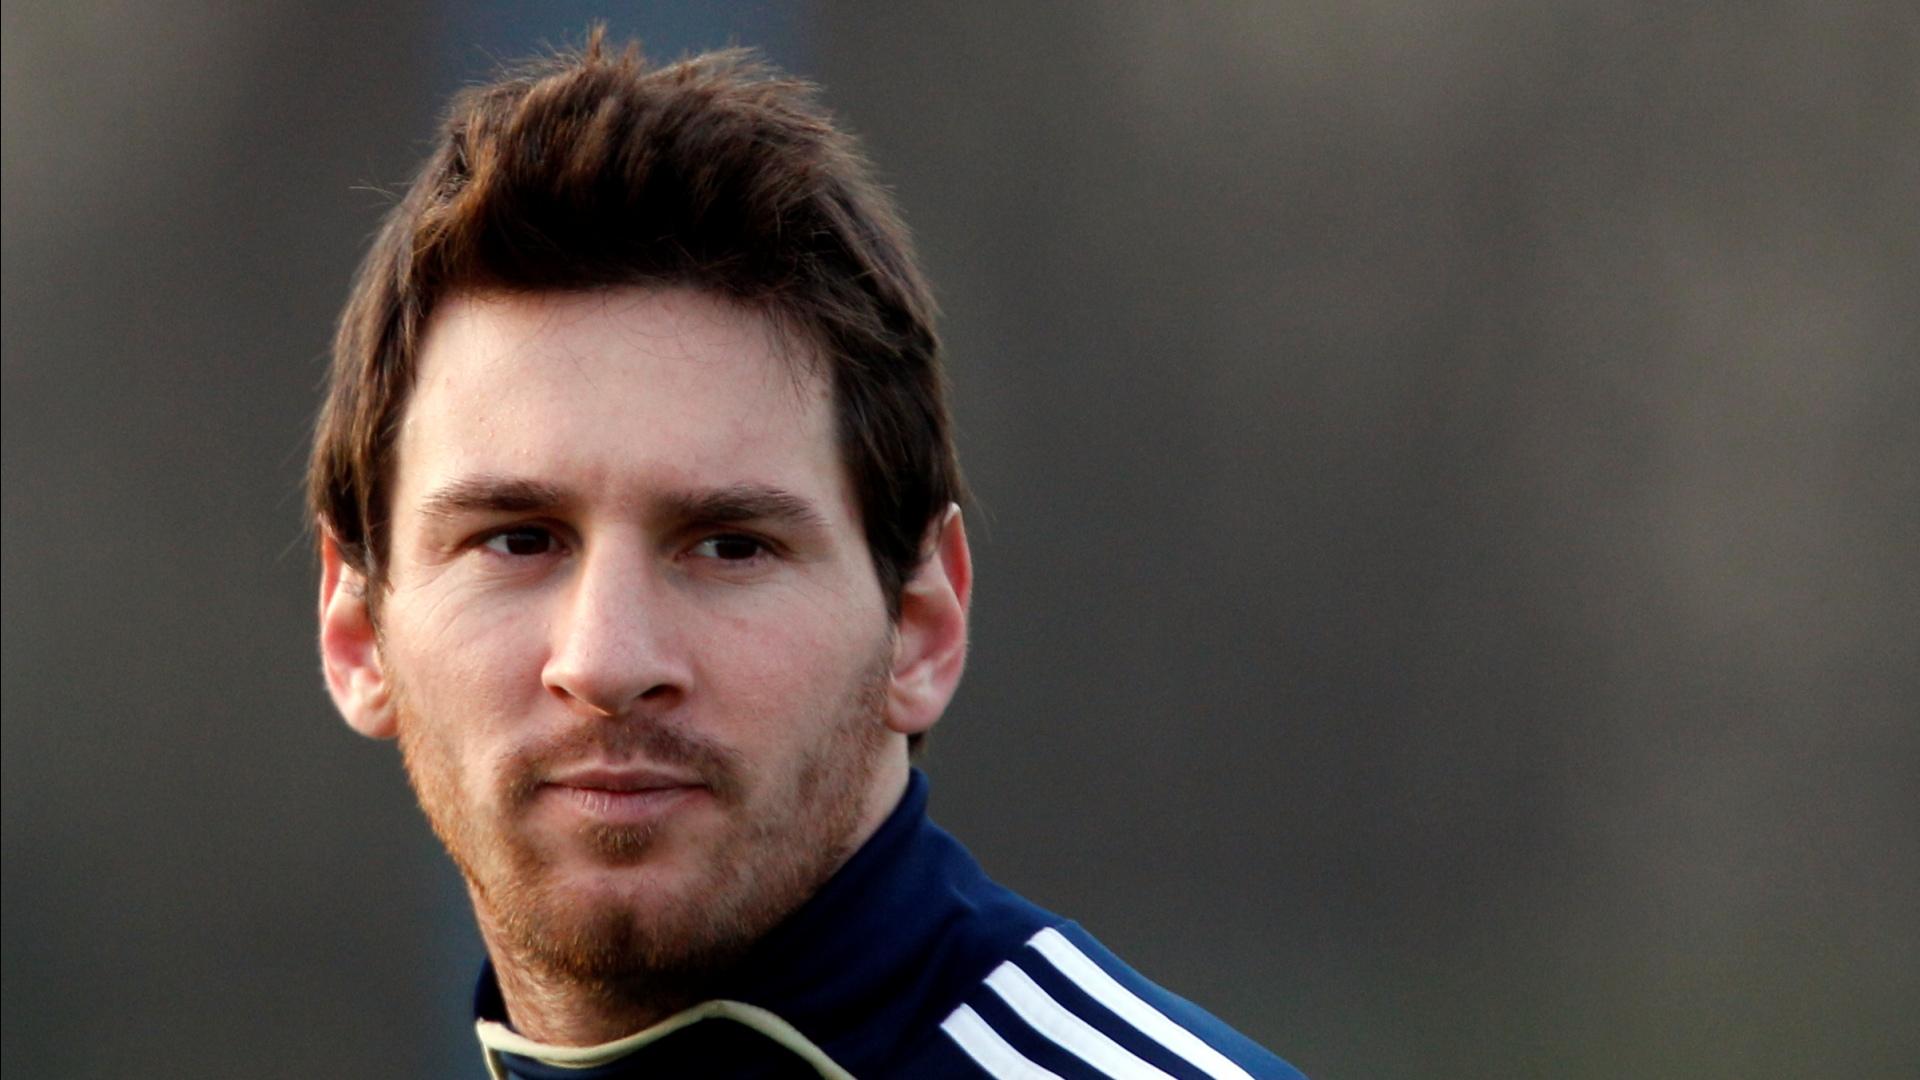 Lionel Messi 2013 Hd Wallpaper